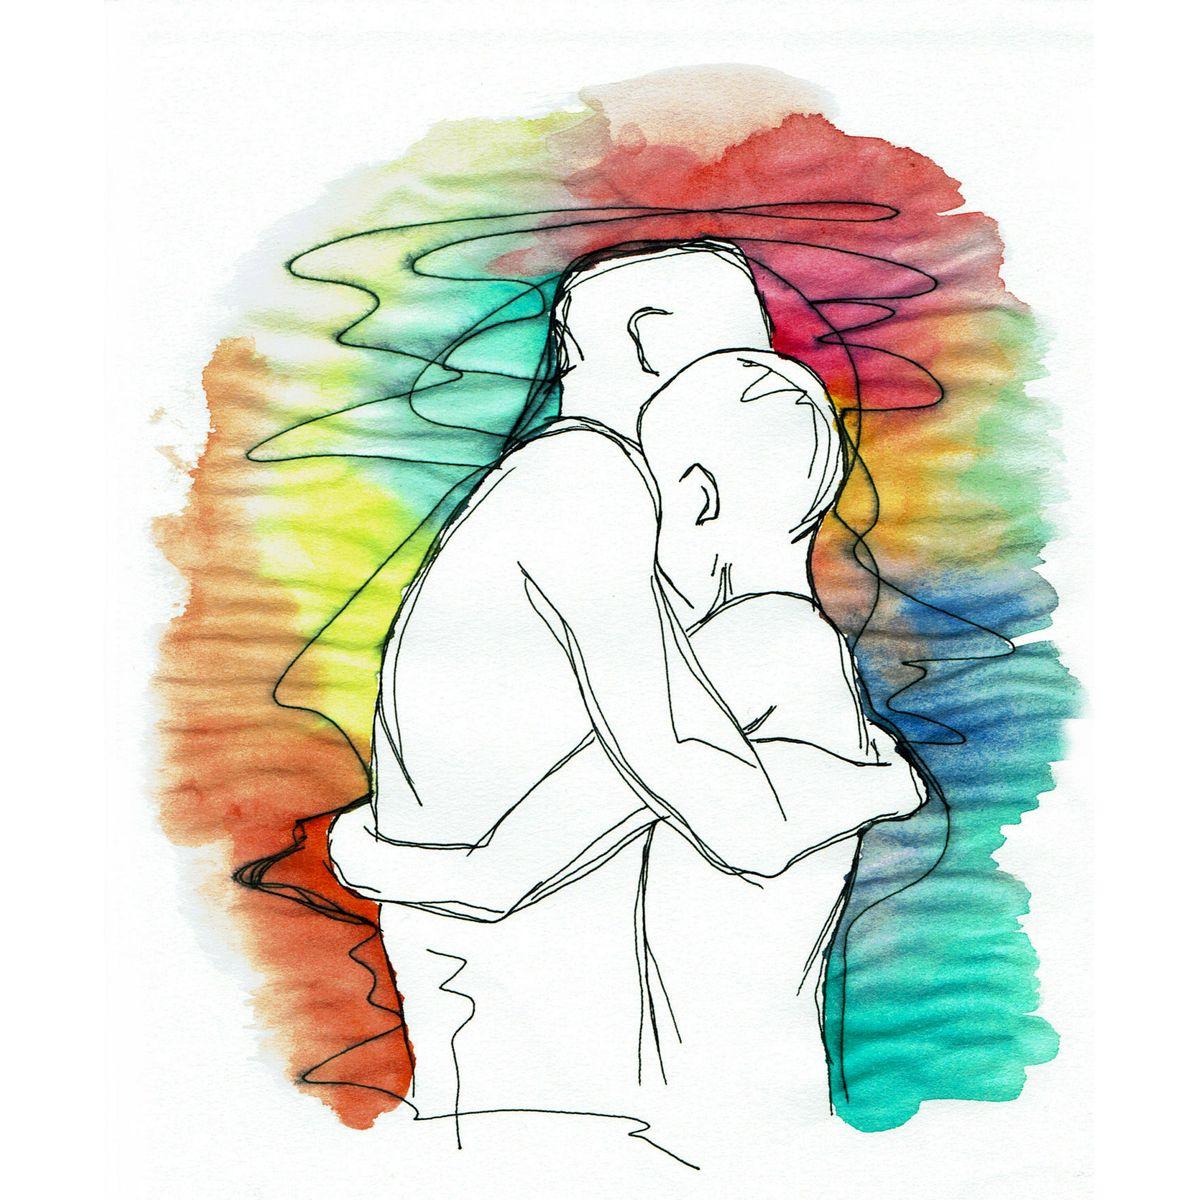 Bedeutung pansexuell Pansexualität: Was